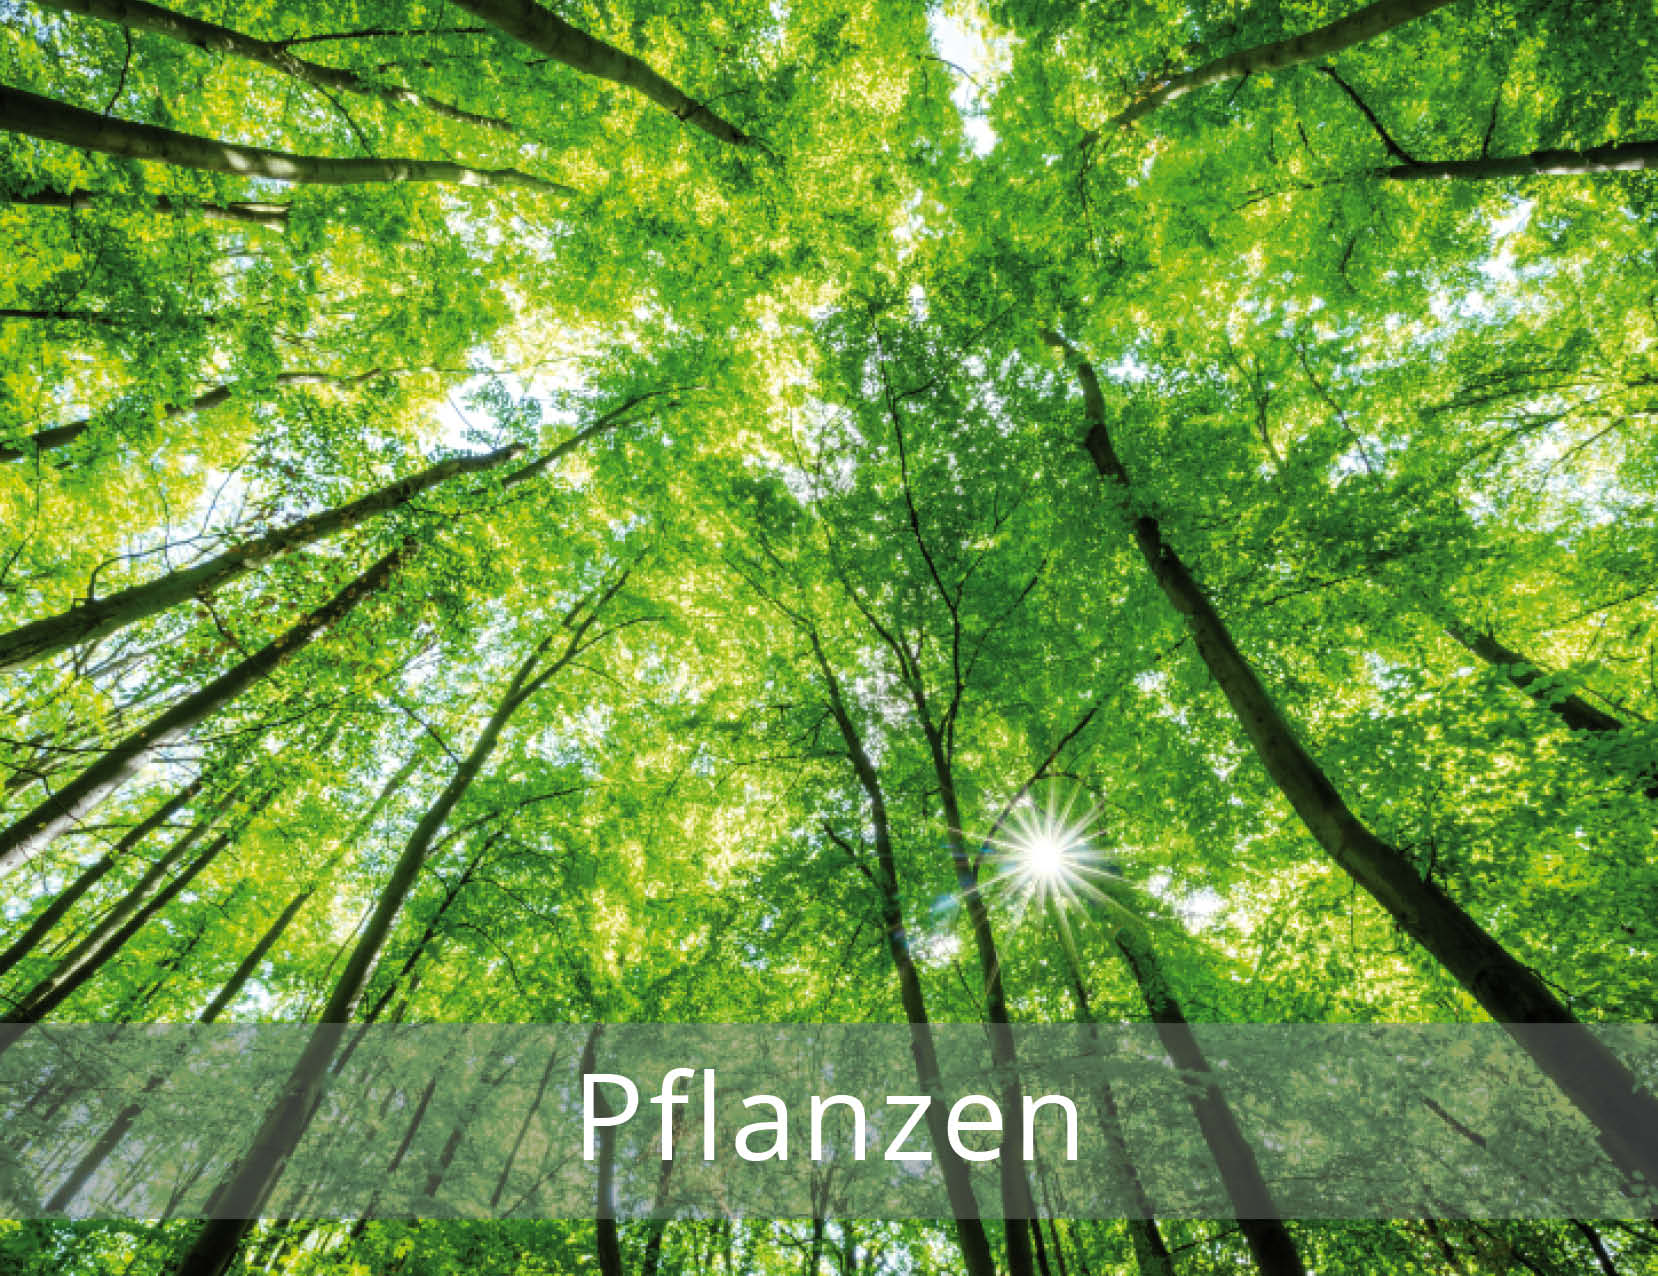 thetahealing-Pflanzen